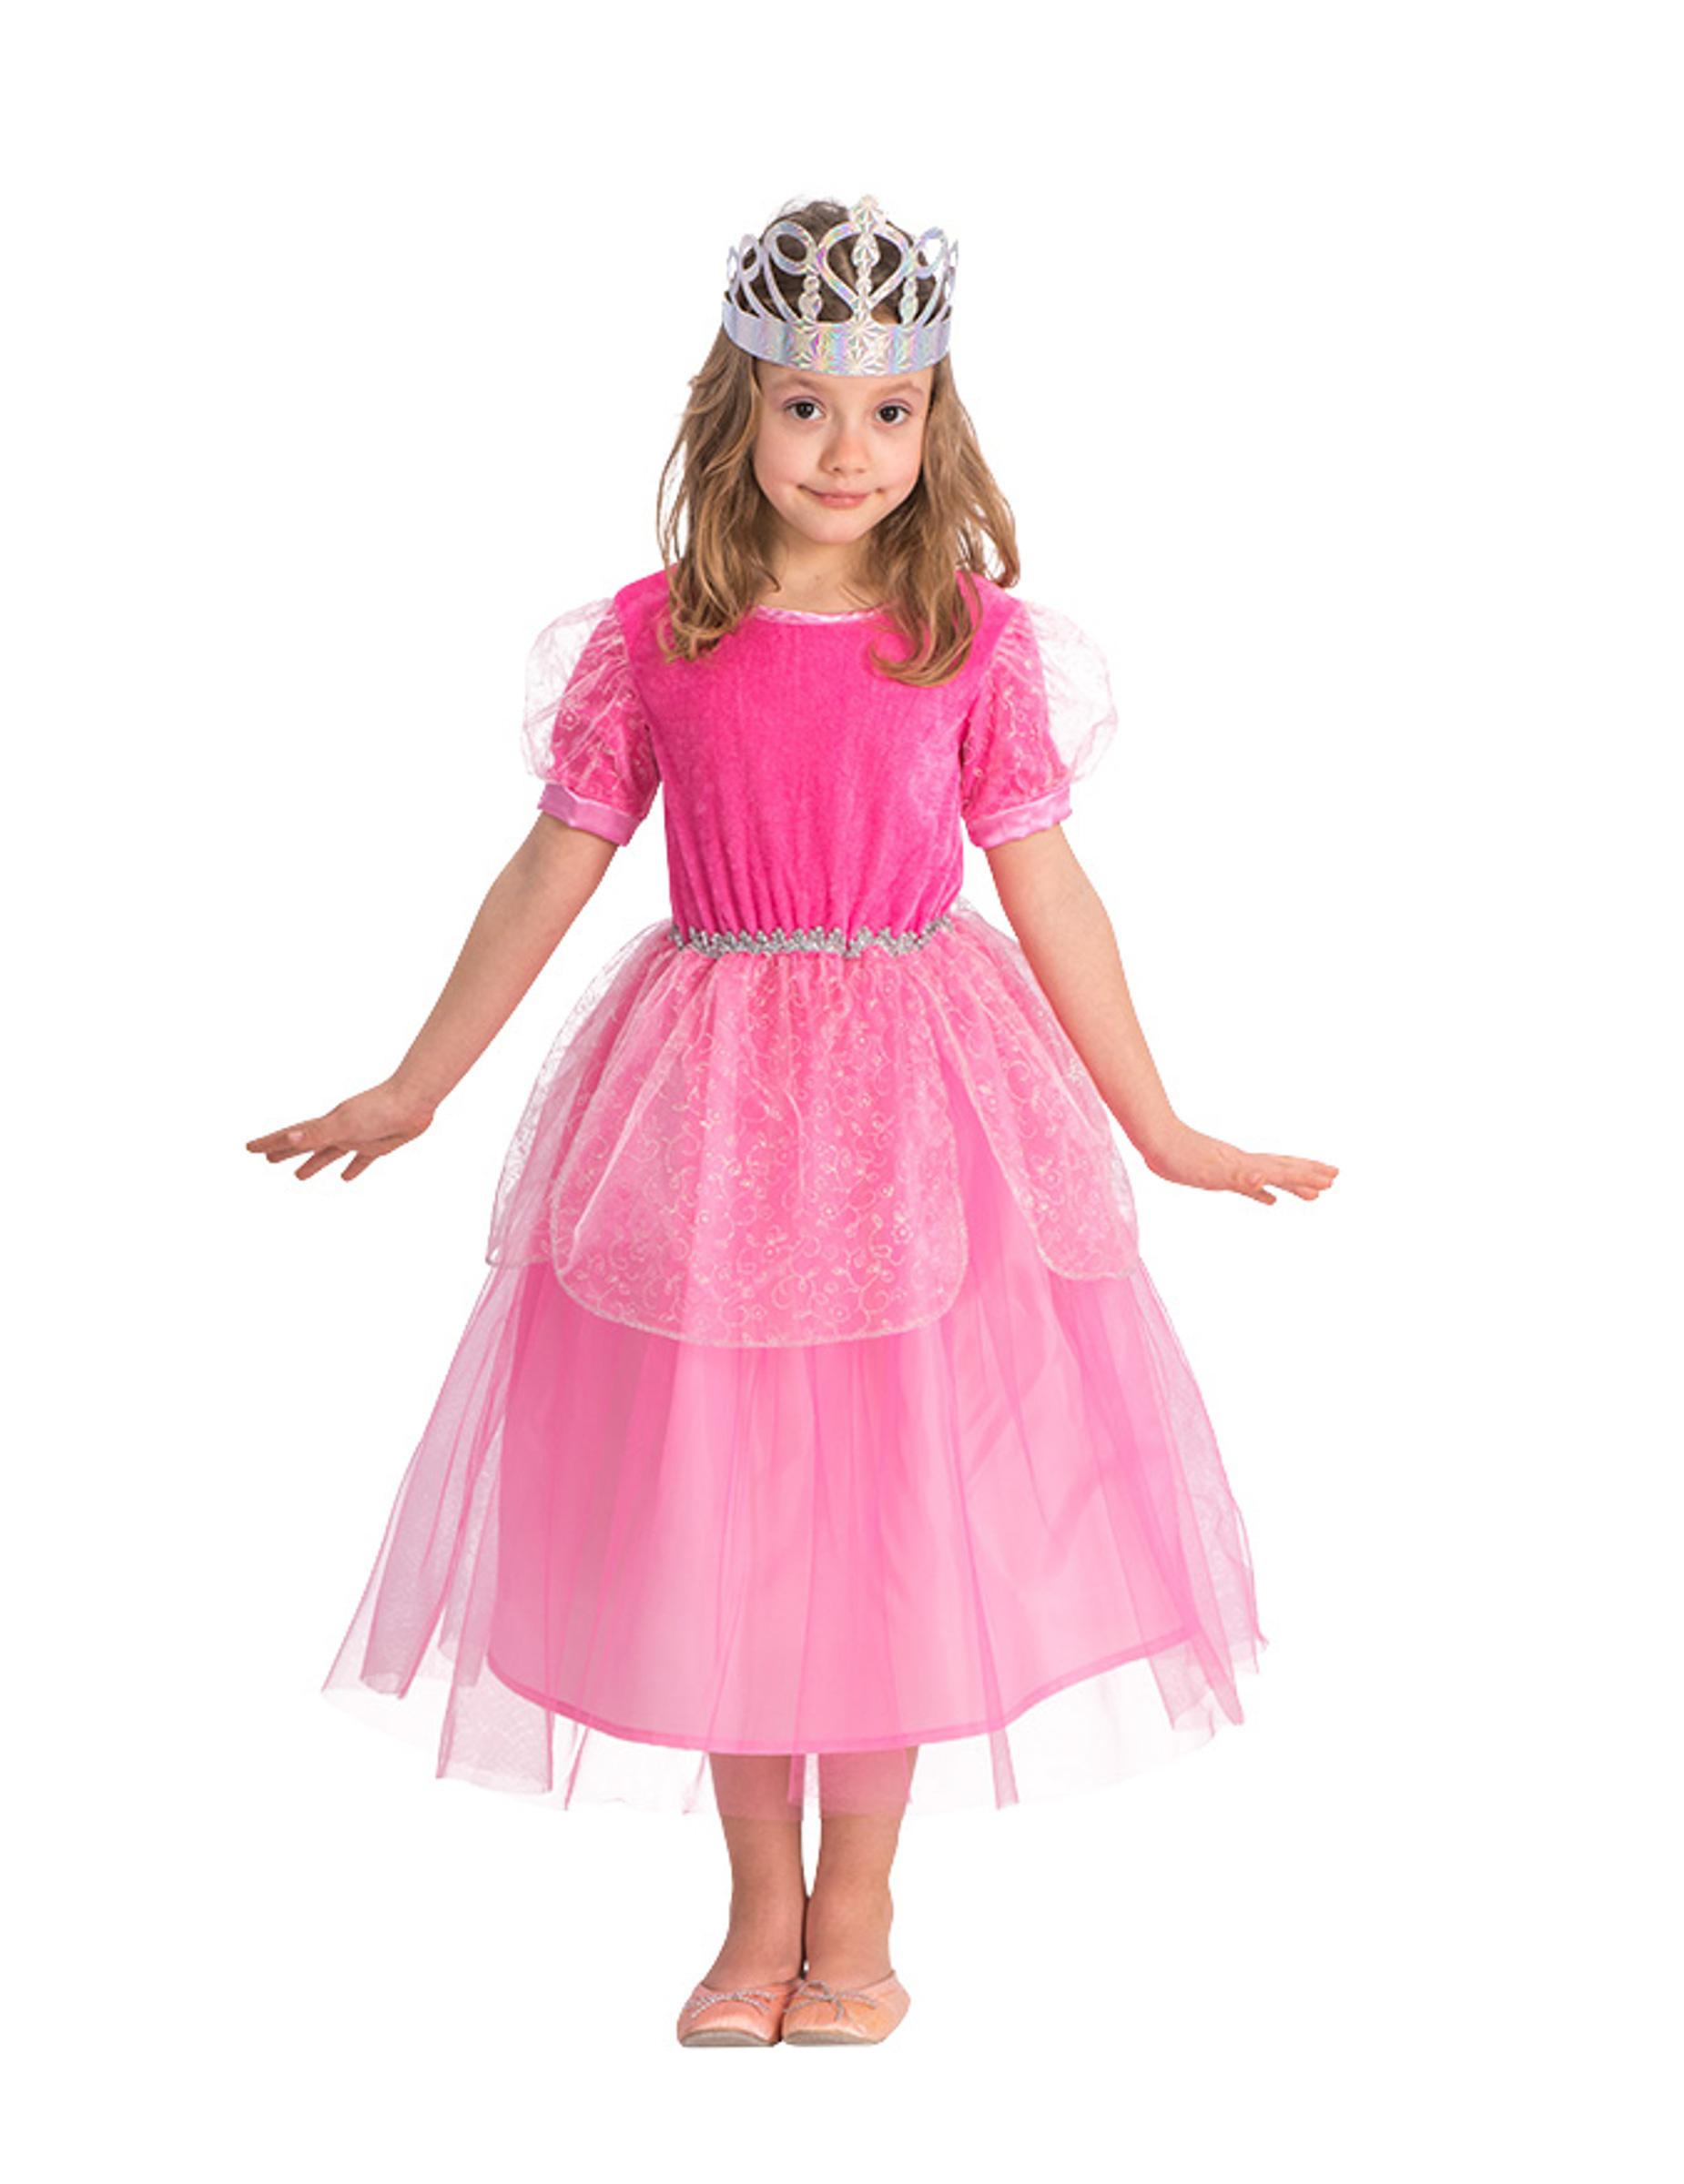 Prinzessin Kinder Kostum Rosa Pink Kostume Fur Kinder Und Gunstige